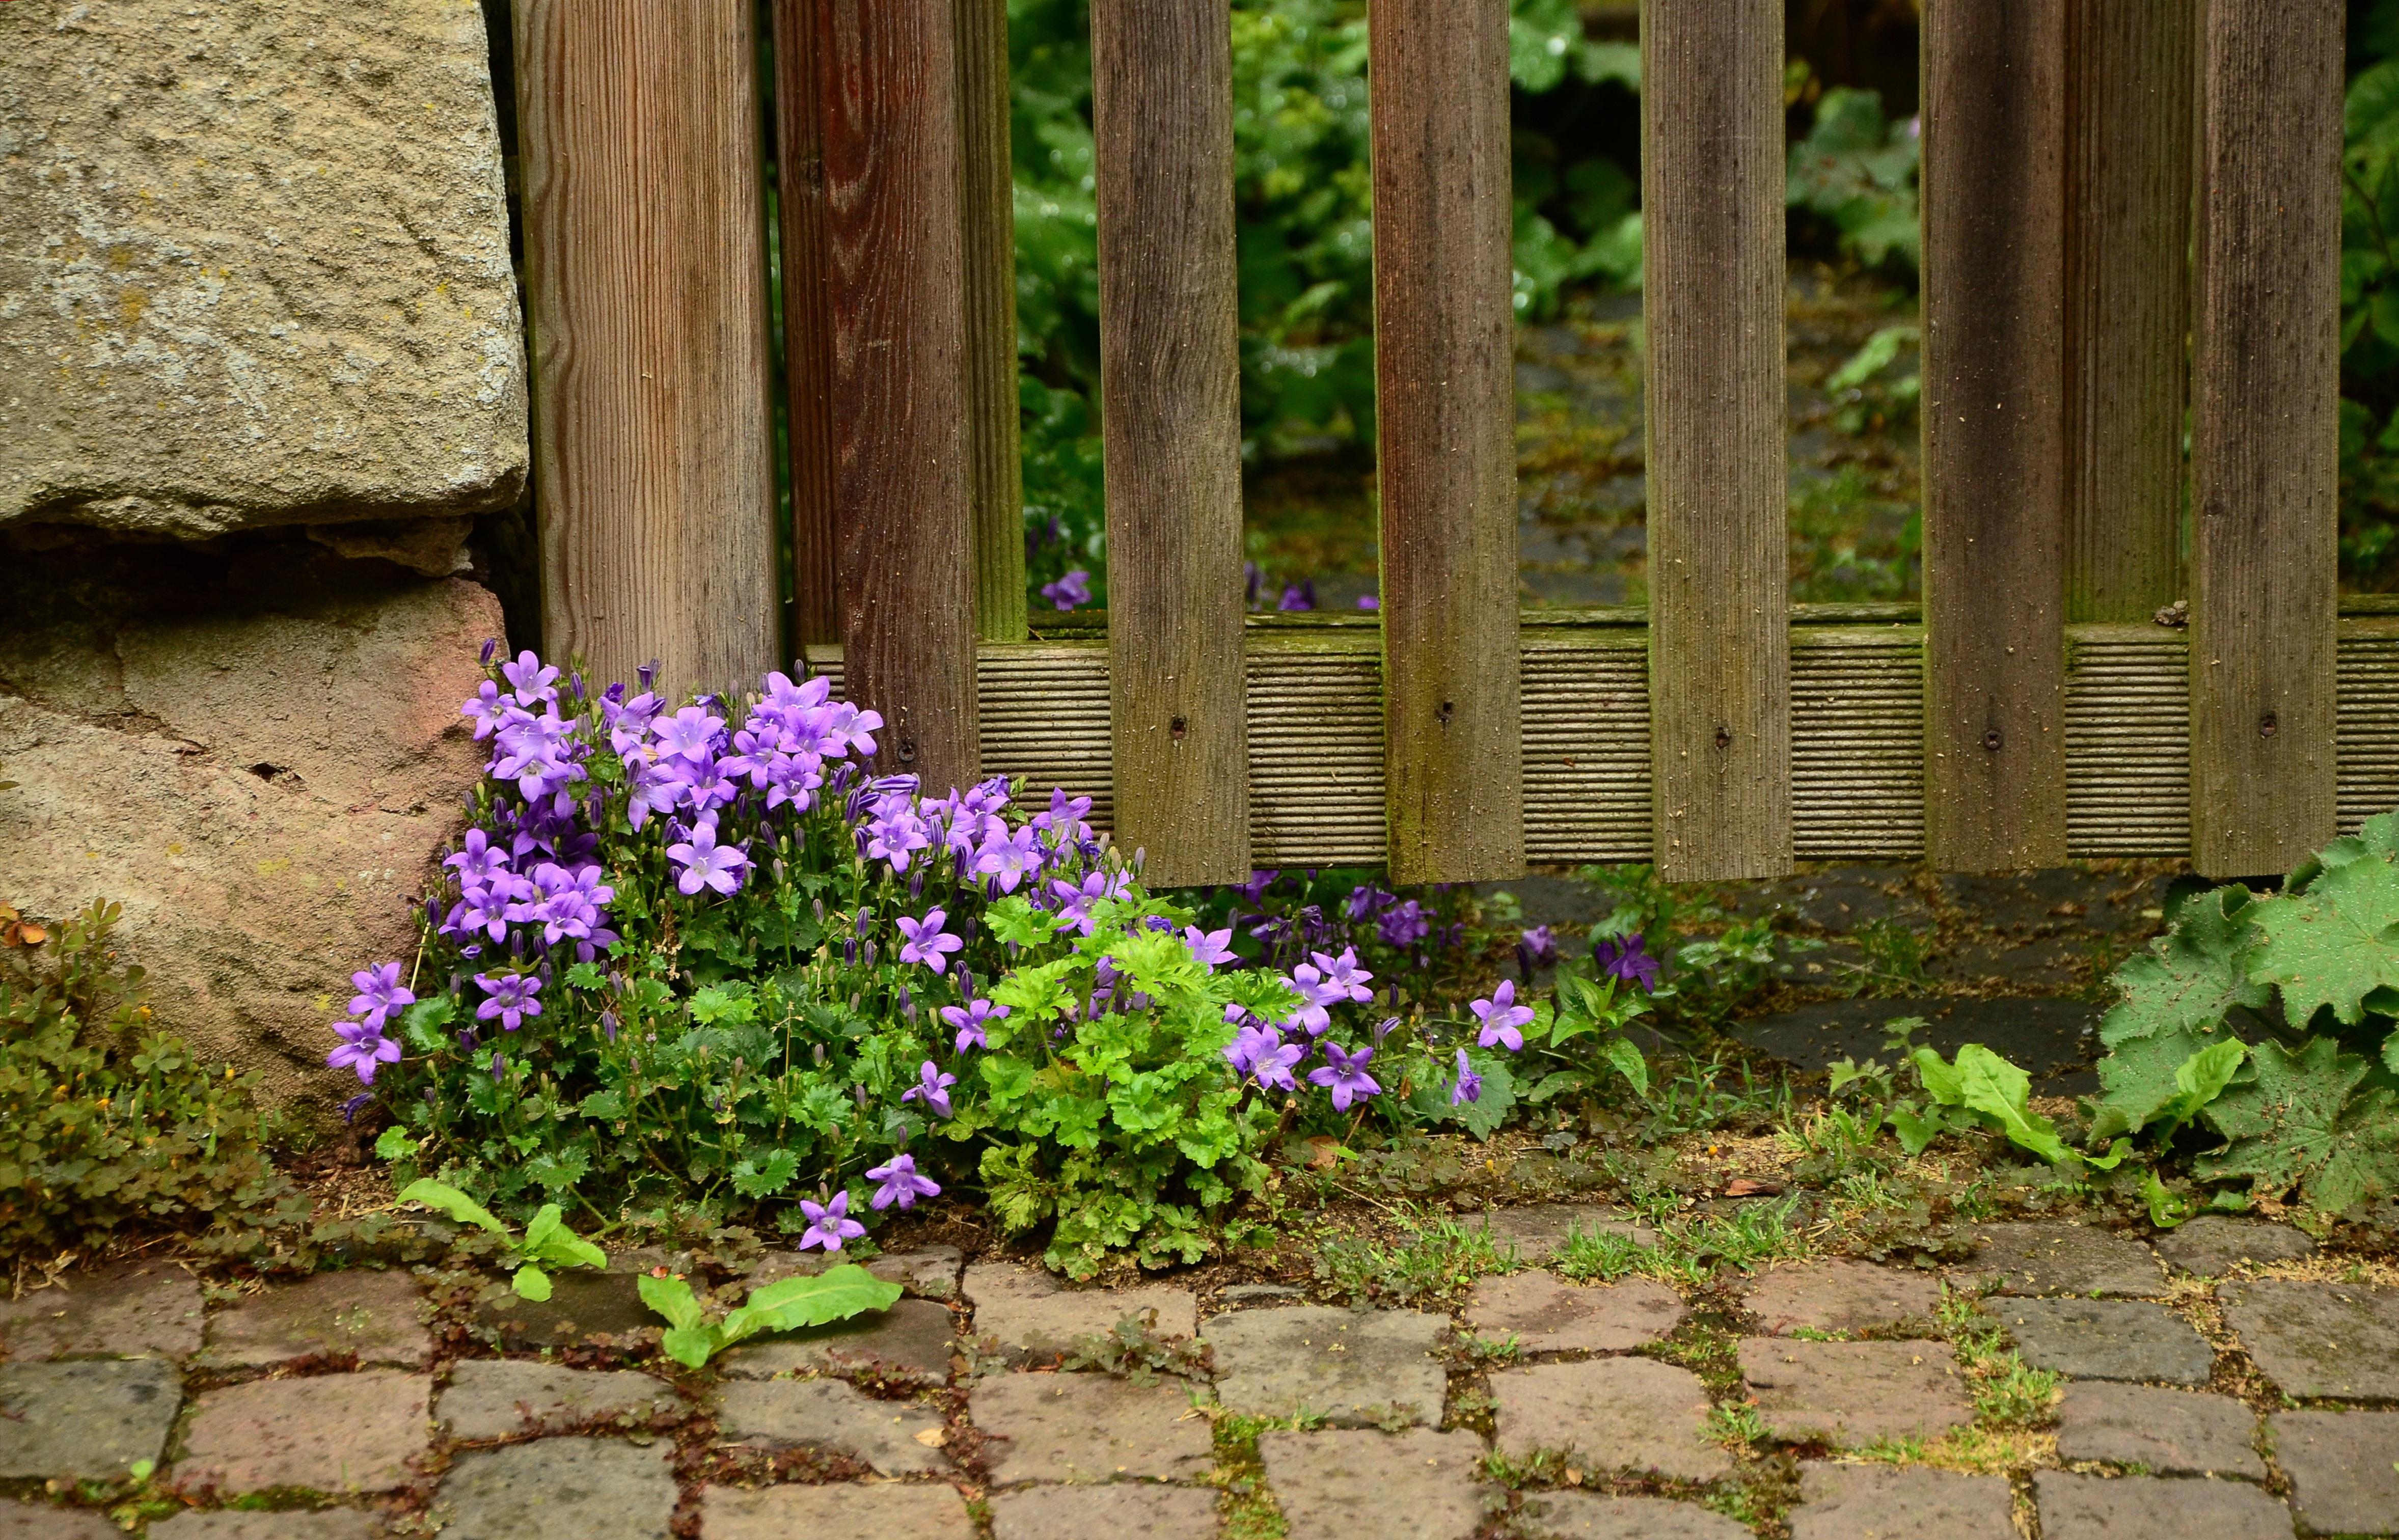 Free Images : plant, lawn, bloom, wall, walkway, summer, idyllic ...